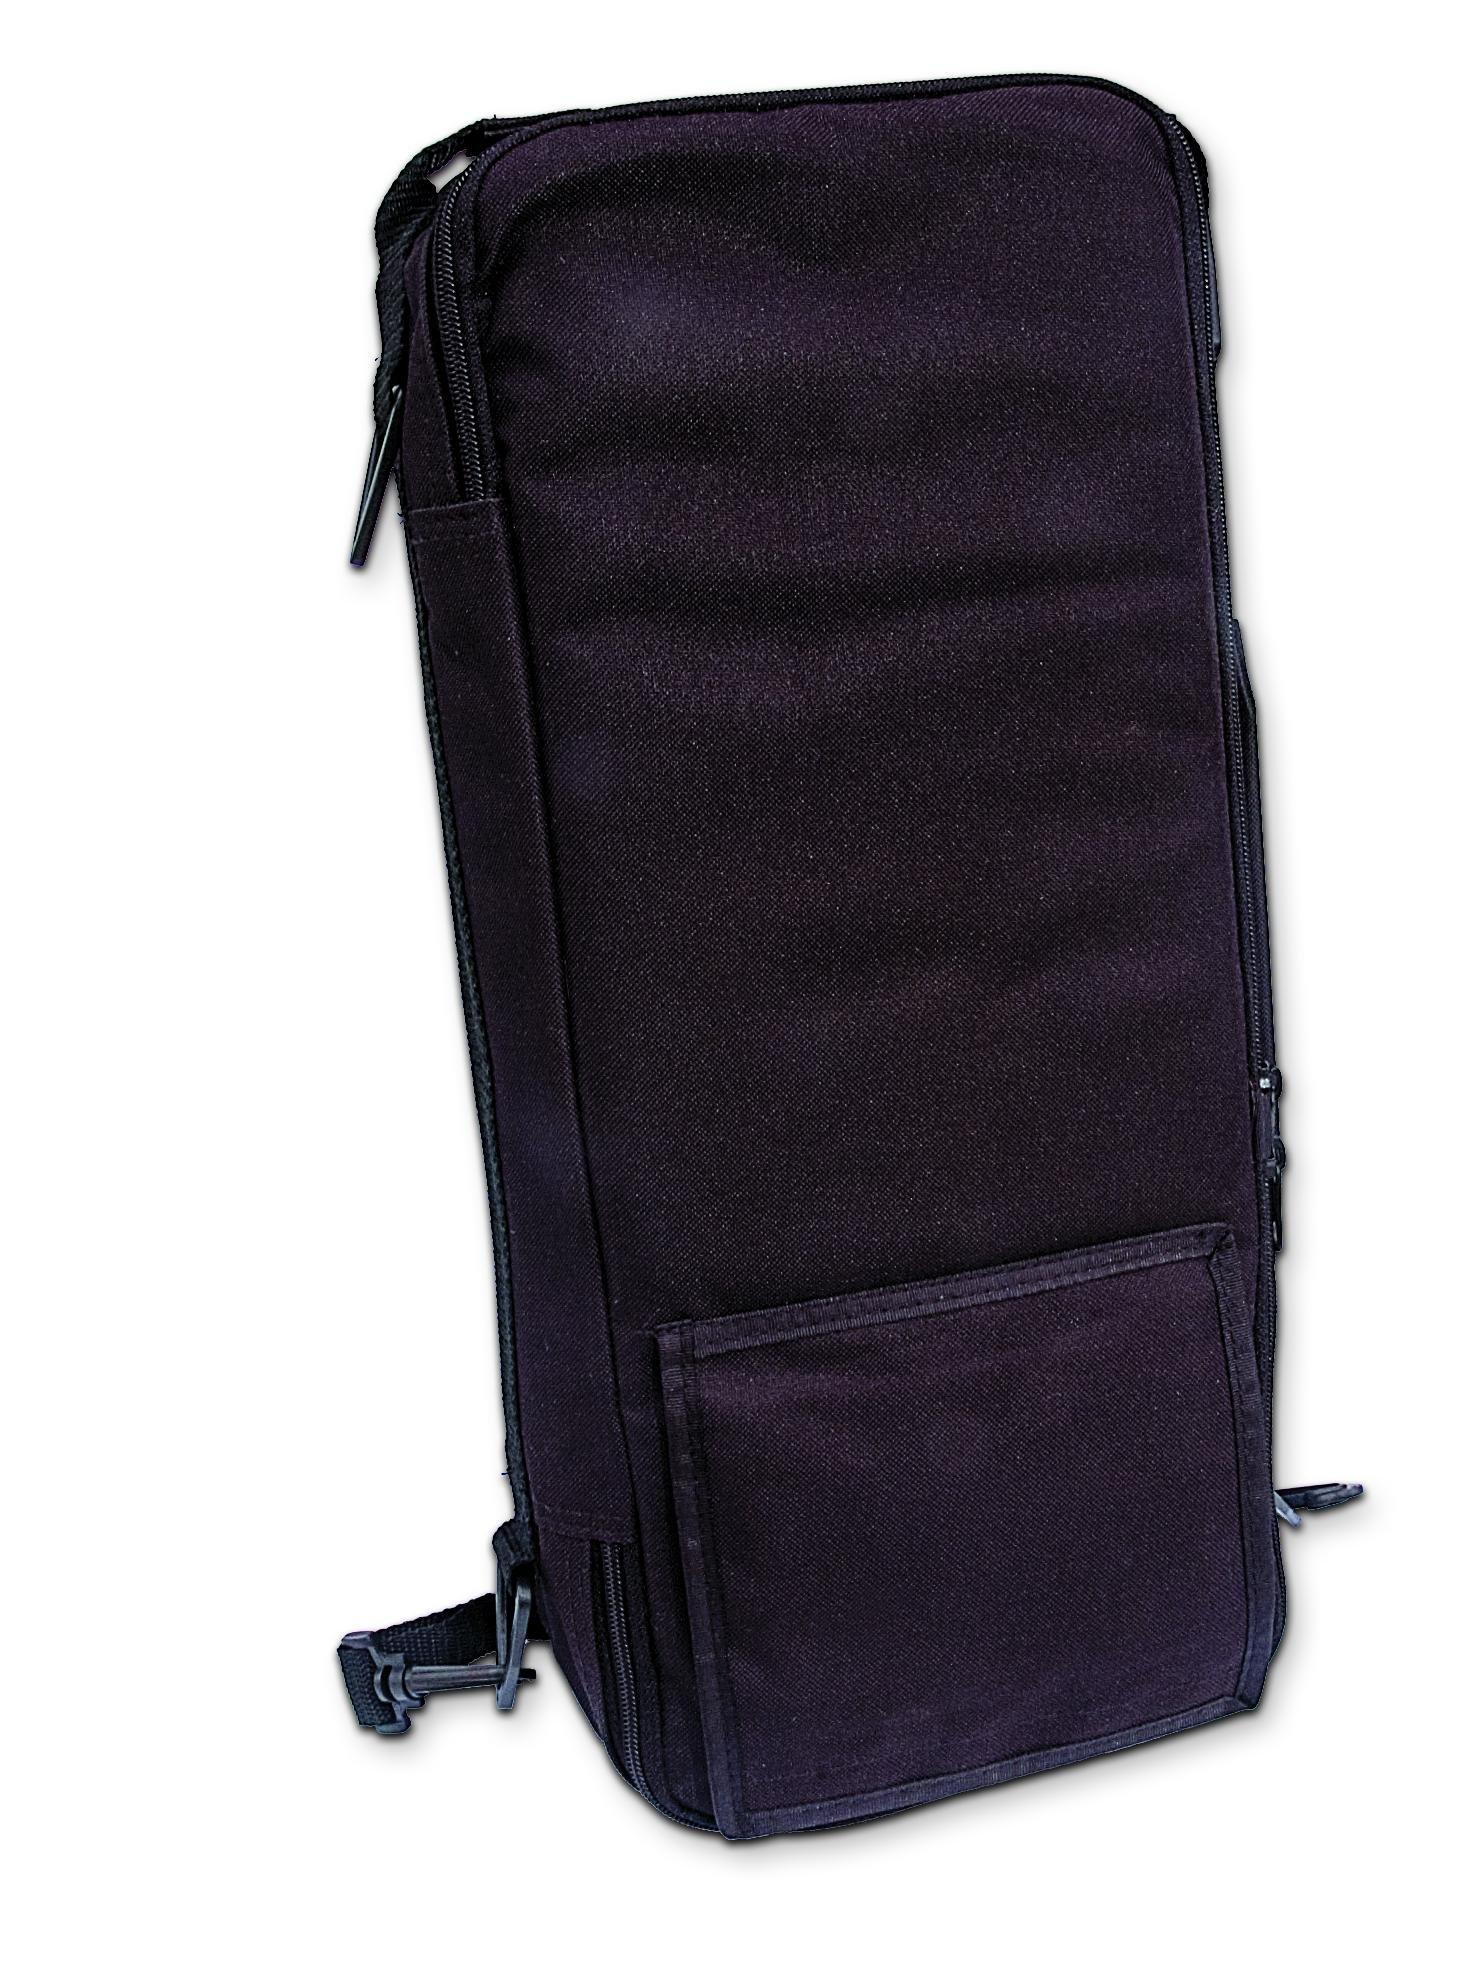 Kangaroo Joey Pump Backpacks - 2 - 1000 ml Dual Flush System Bags, 18'' x 8'' x 3 1/2'', Backpack or Over-the-Shoulder Bag - 1 Each